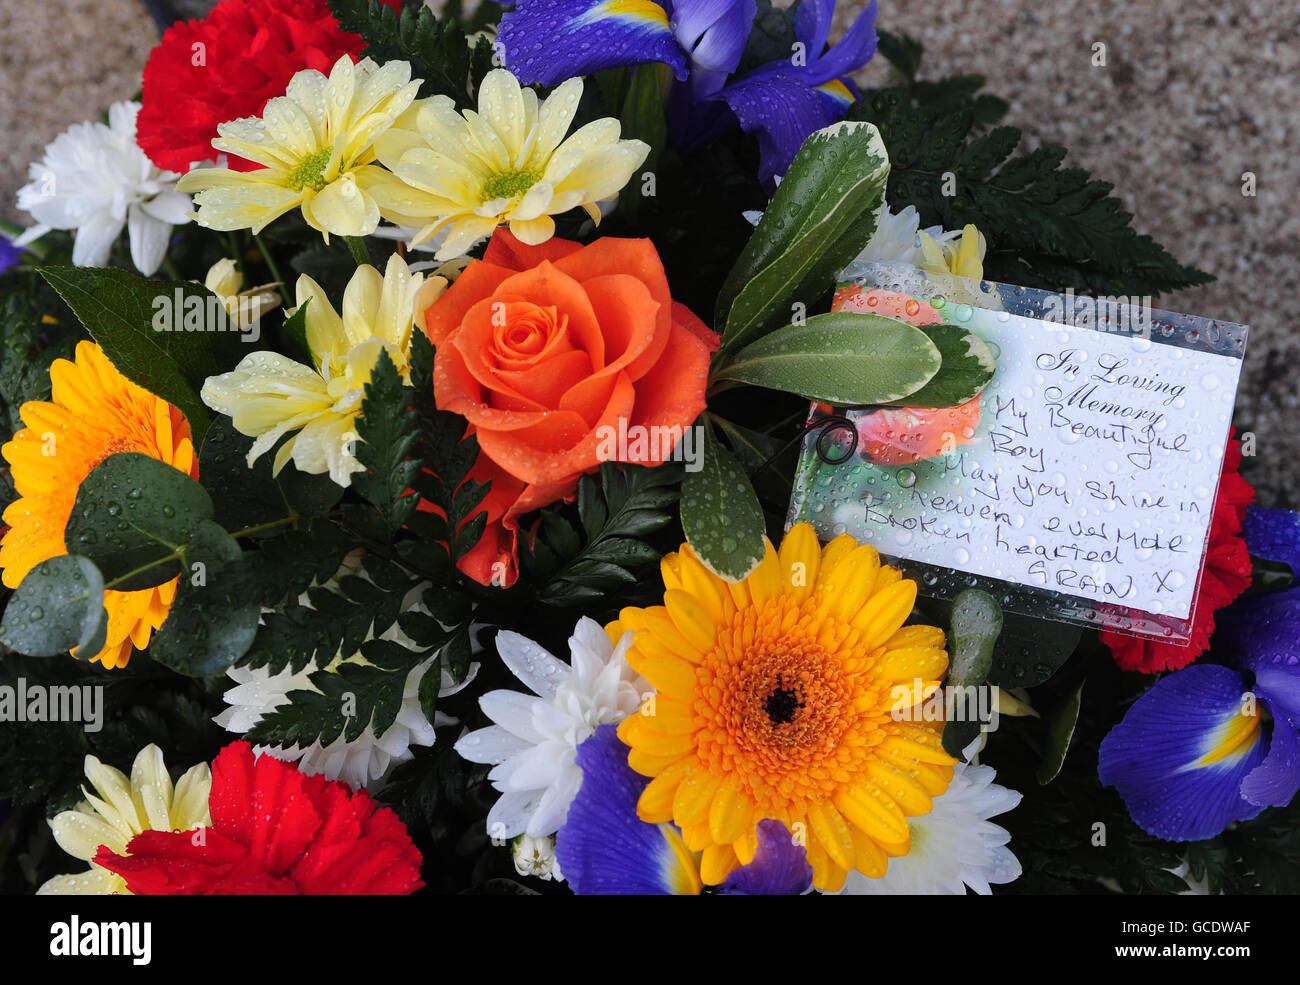 Nicholas Smith funeral - Stock Image